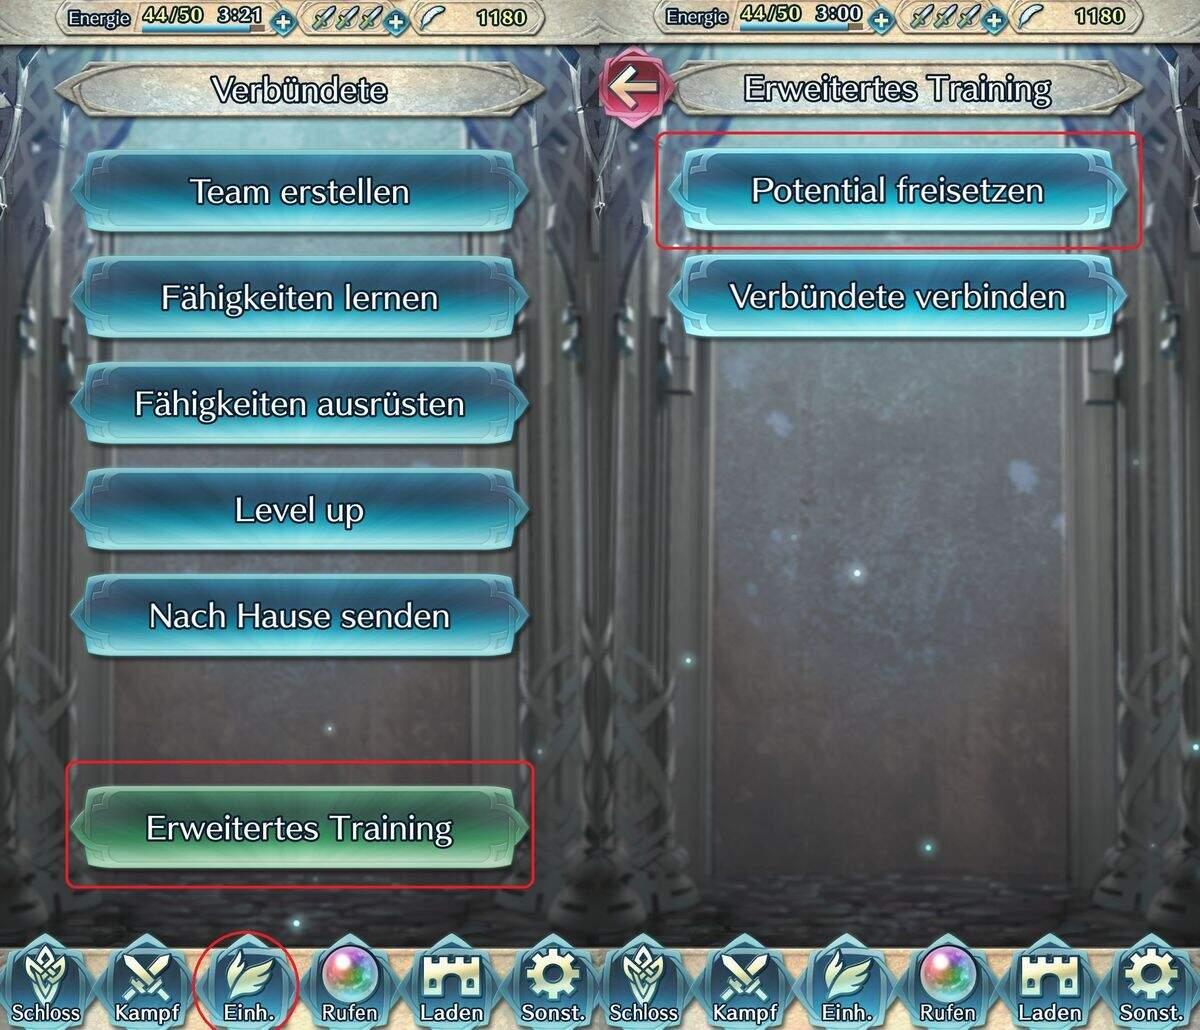 Fire Emblem Heroes Charaktere Potential freisetzen